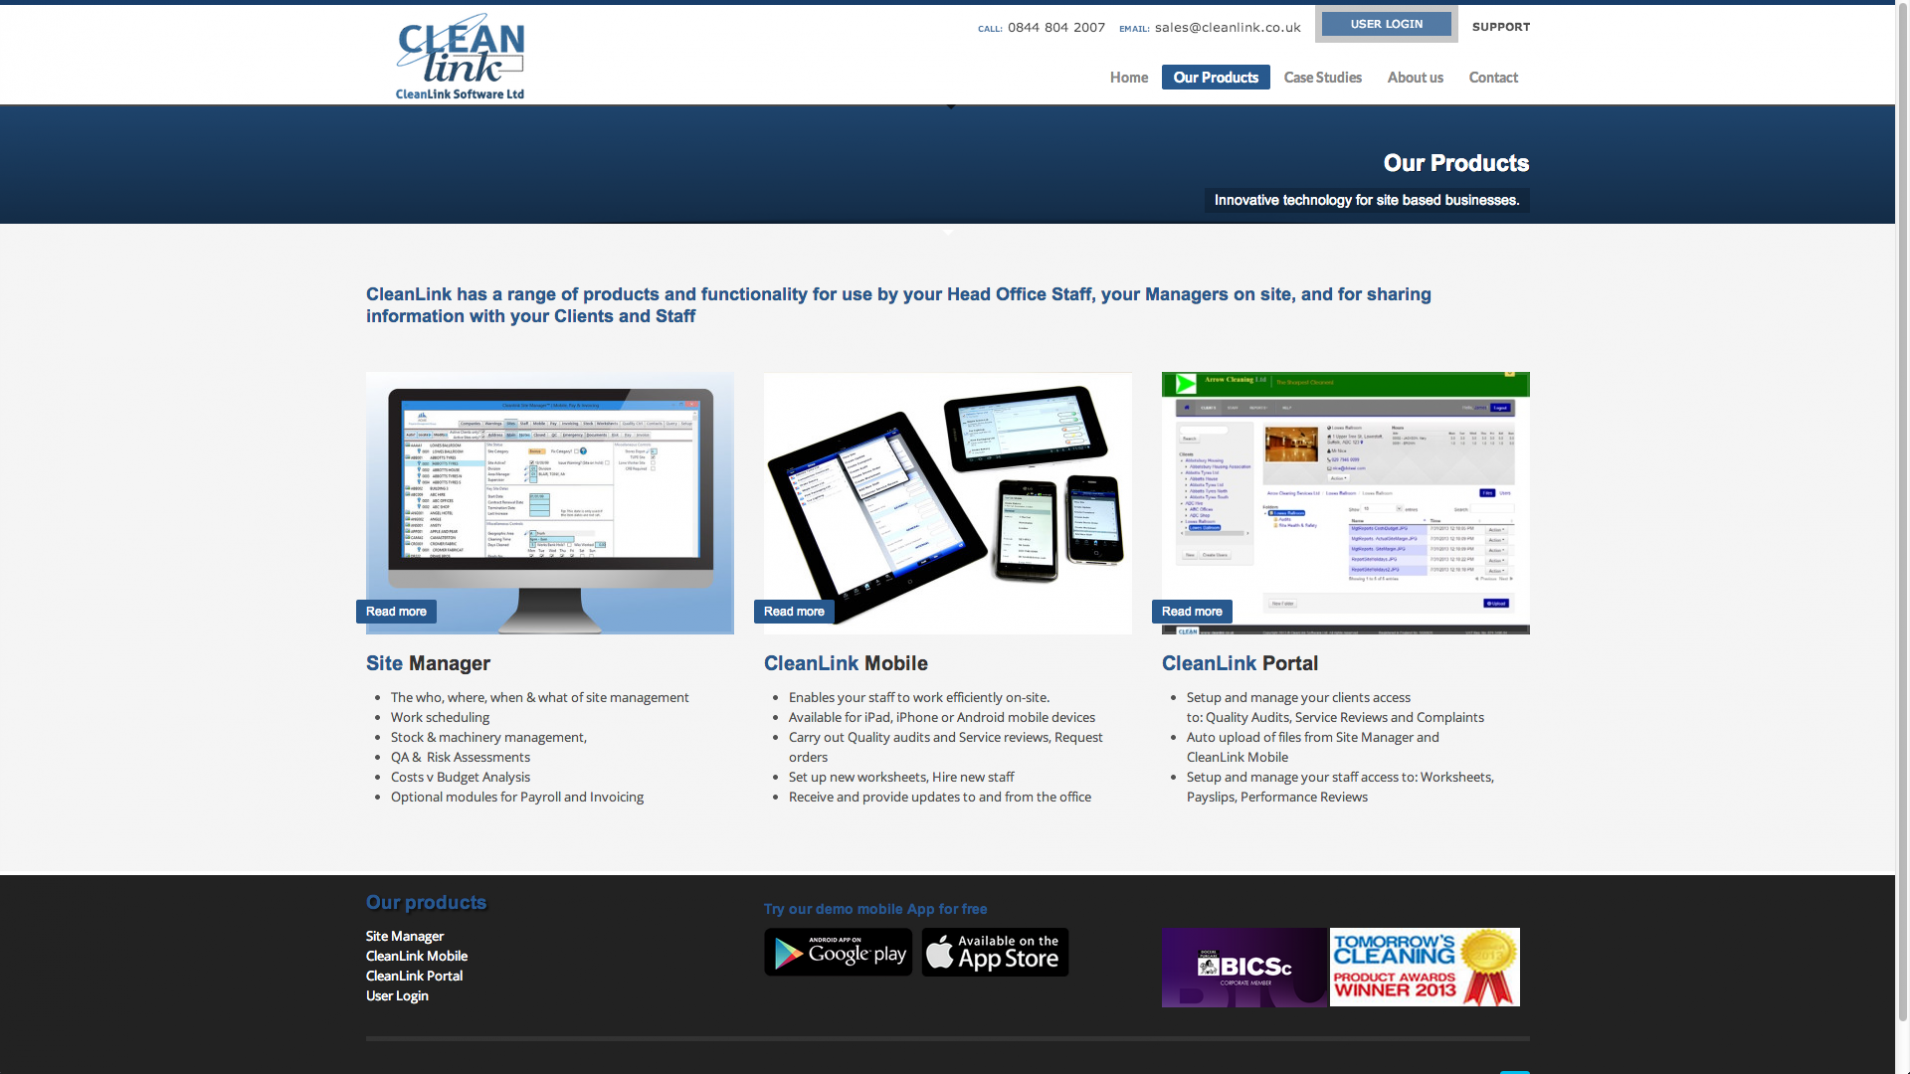 Screen Shot 2013 12 23 at 16.27.31 - Webdesign for software development company